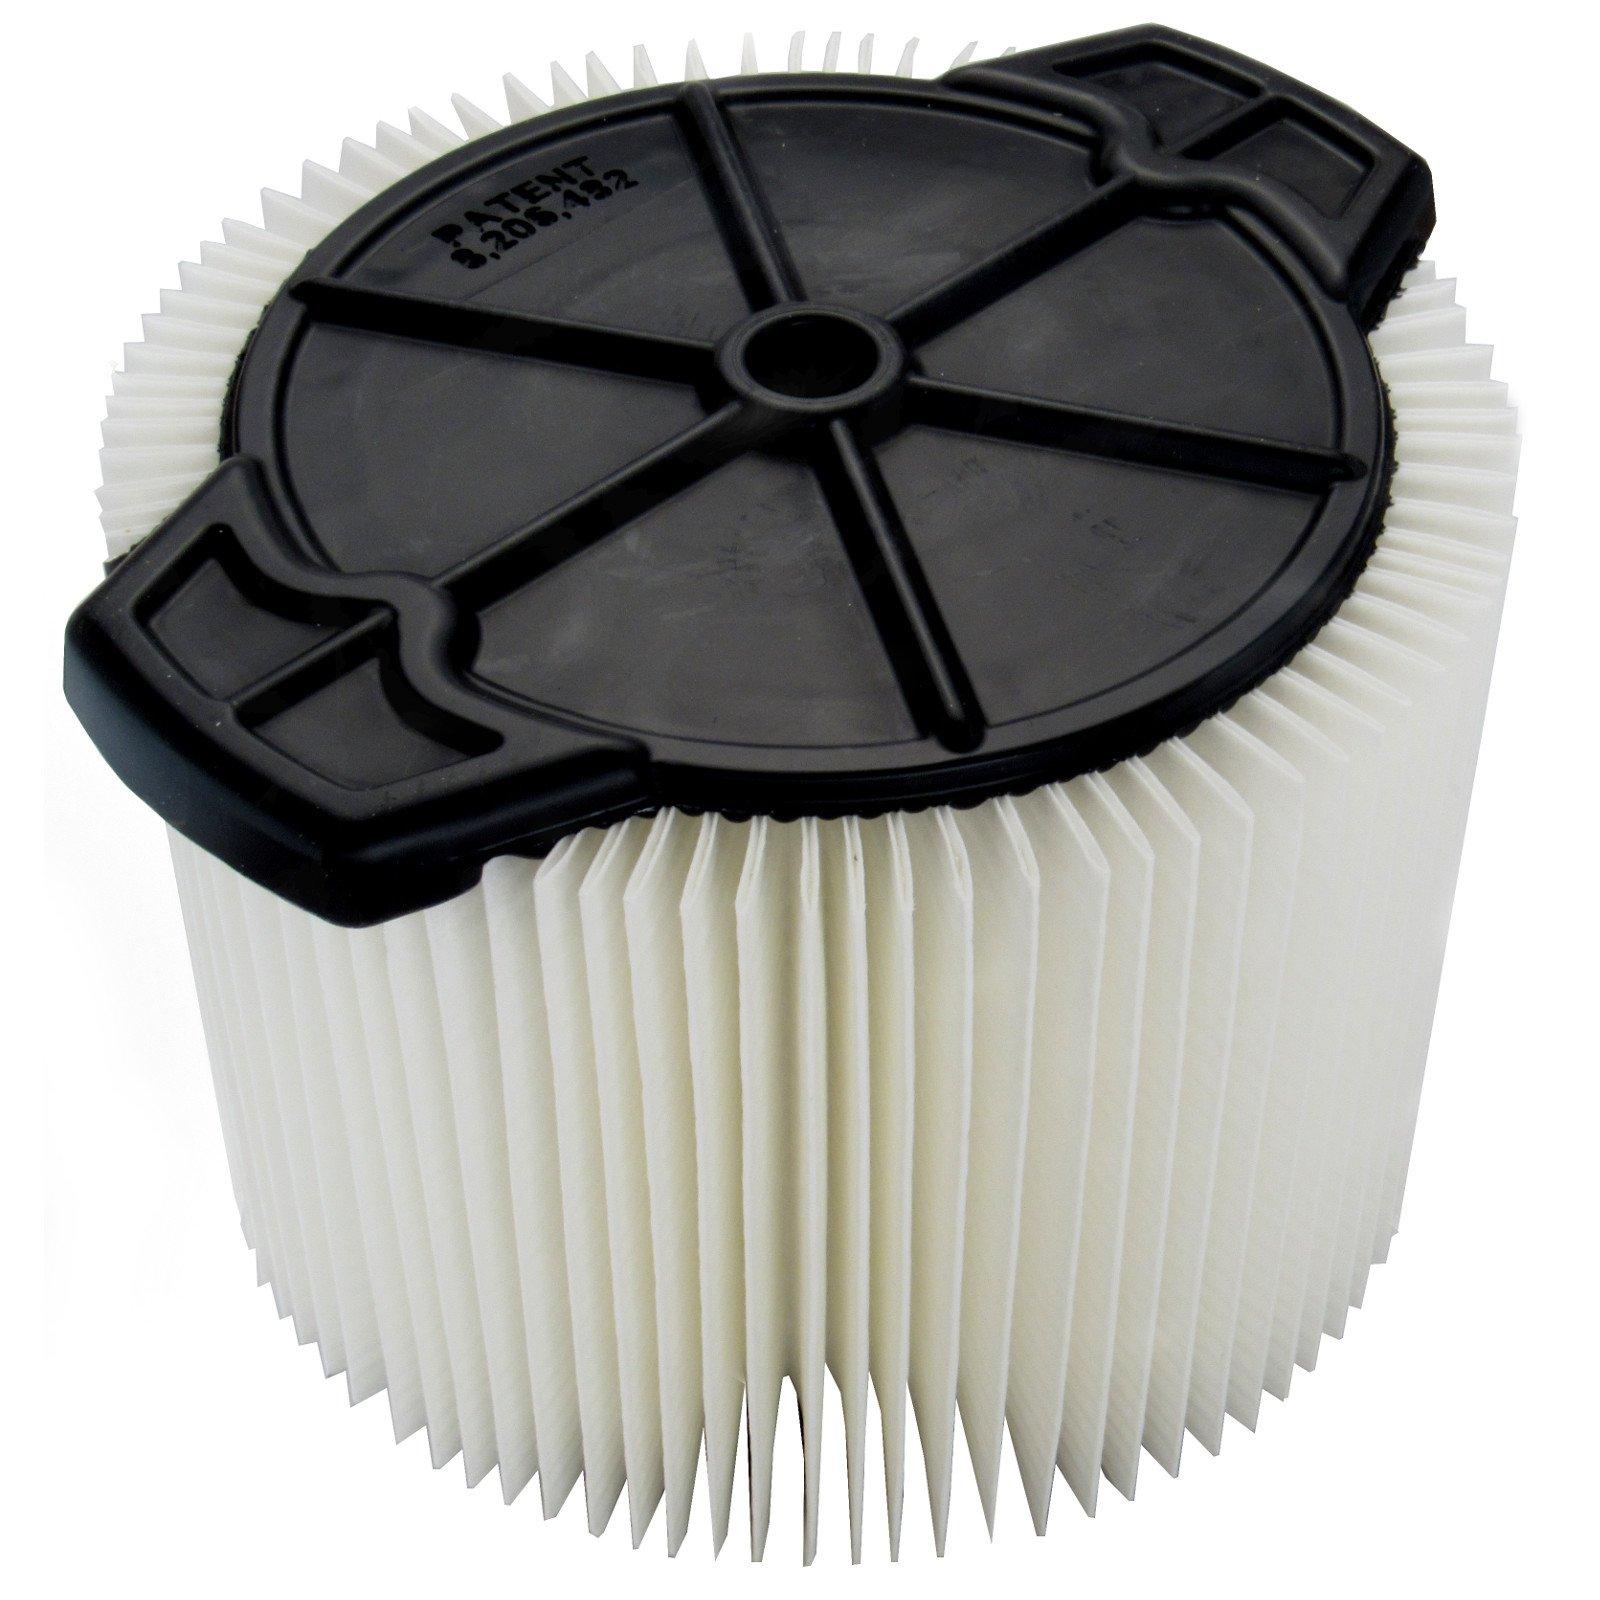 Ridgid VF3400 Pleated Filter For 4-4.5 Gal Vac